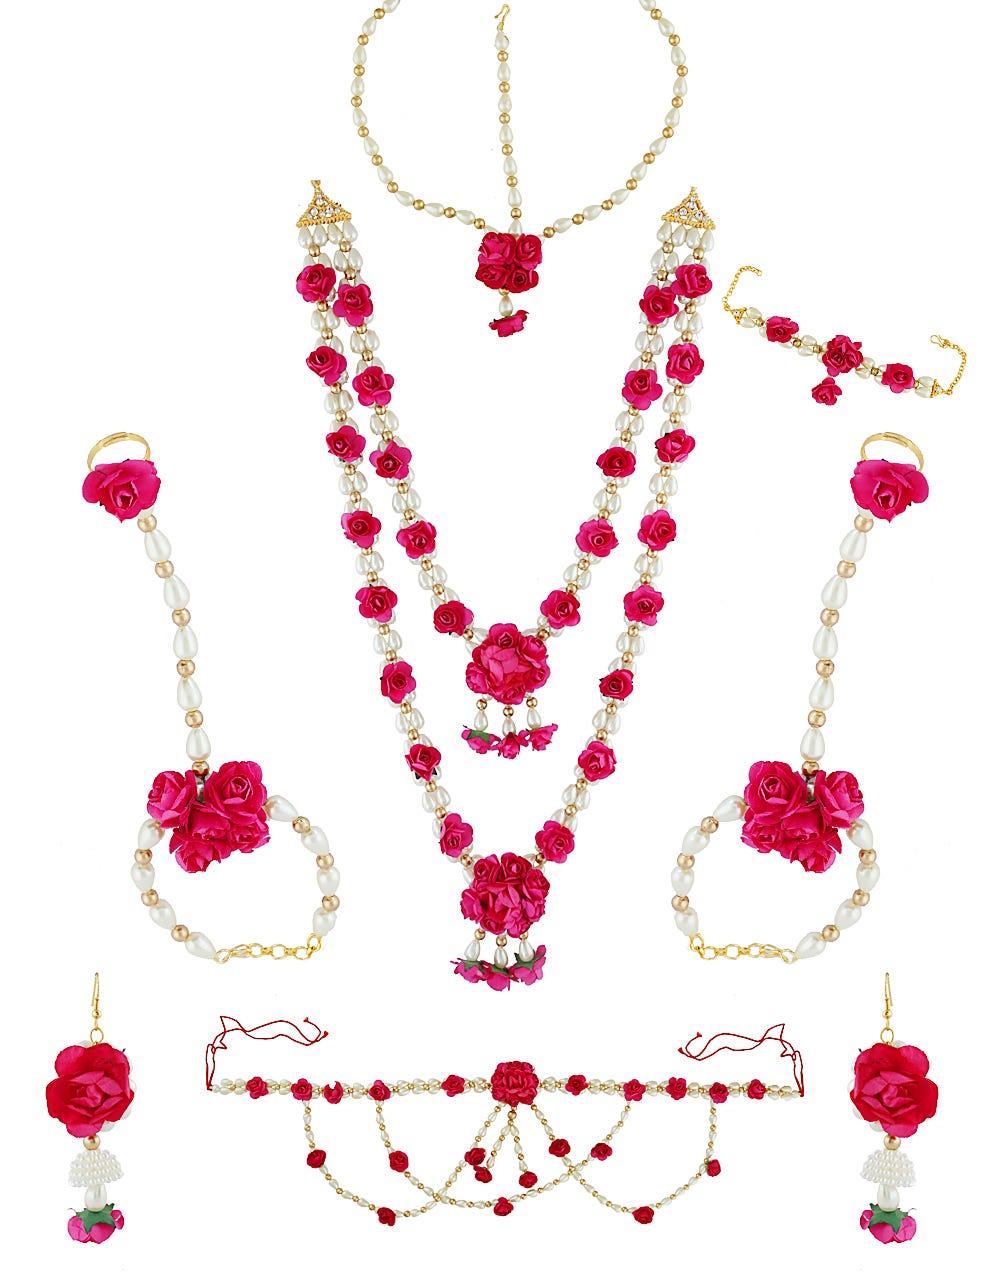 Dohale Jevan Jewellery : dohale, jevan, jewellery, Exclusive, Artificial, Floral, Jewellery, Haldi, Anuradha, Singh, Medium